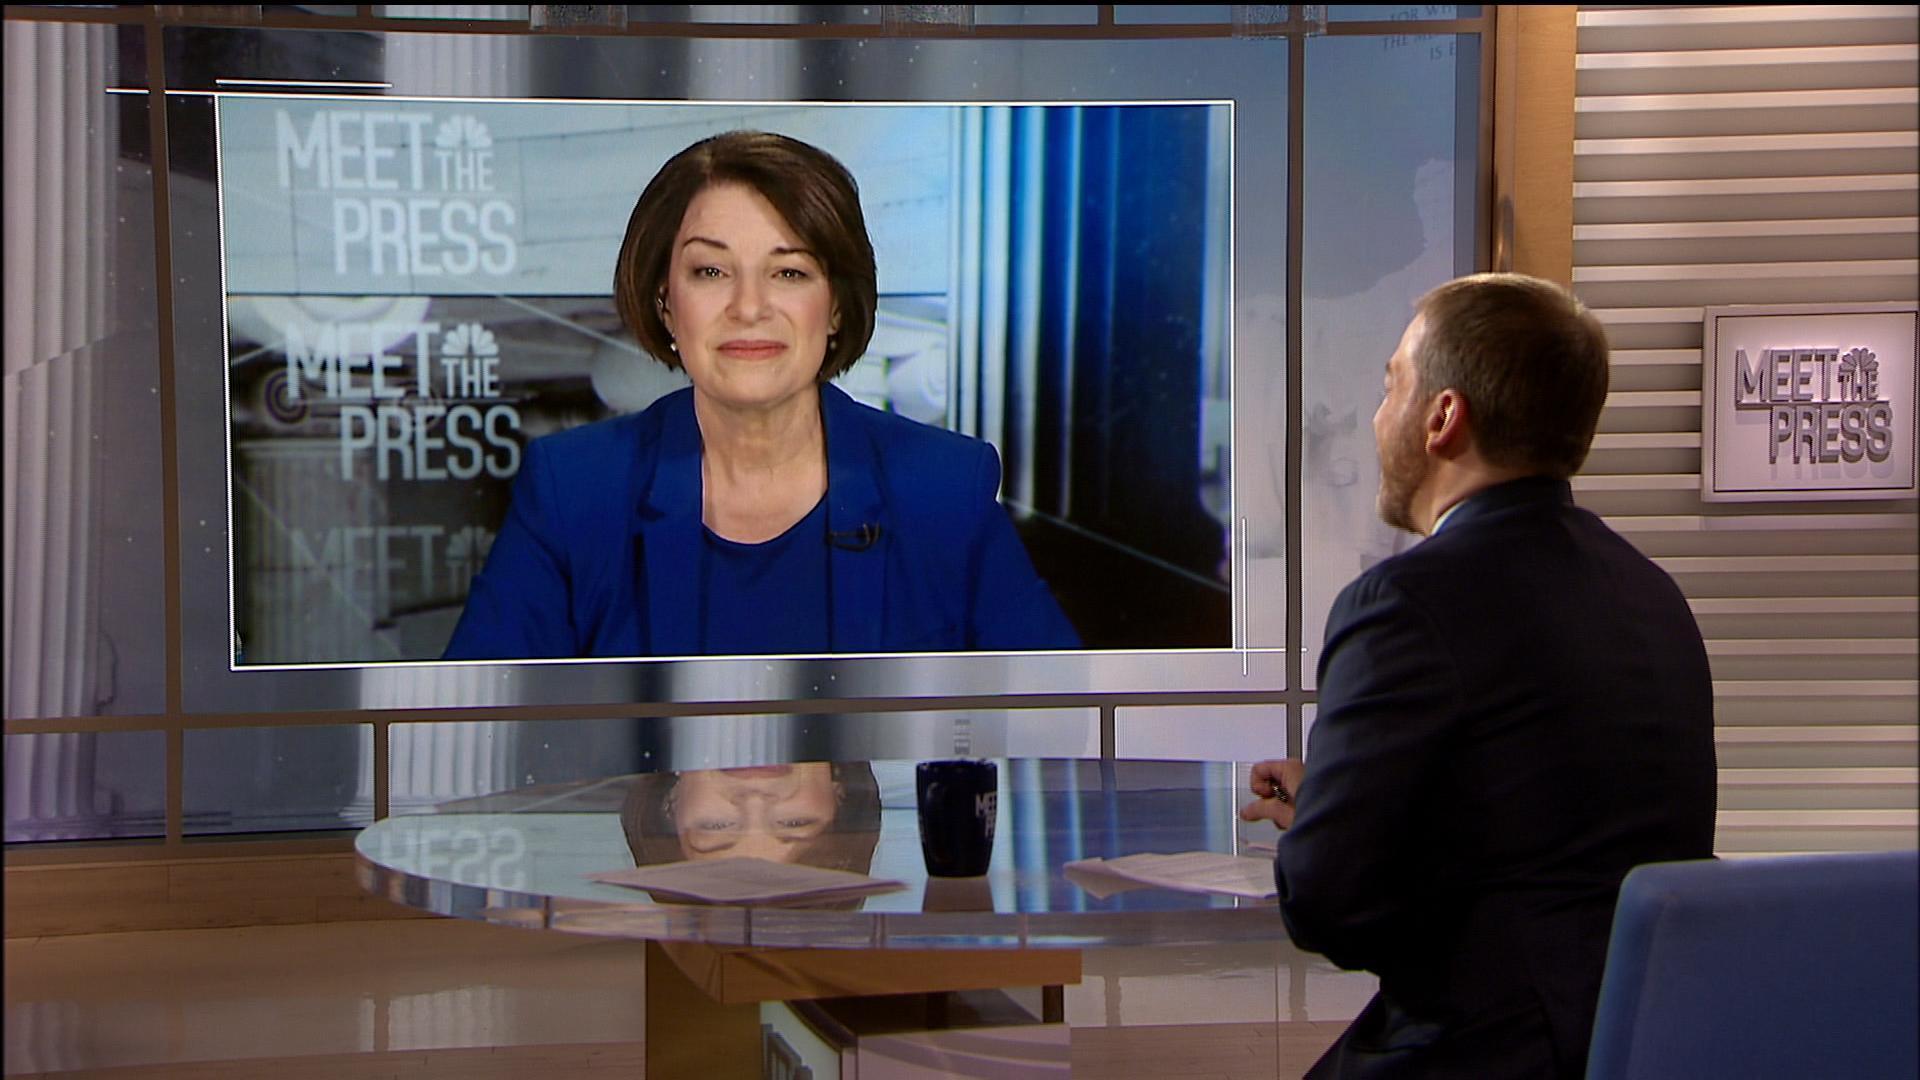 Biden, Klobuchar hit Bloomberg's record ahead of Nevada debate